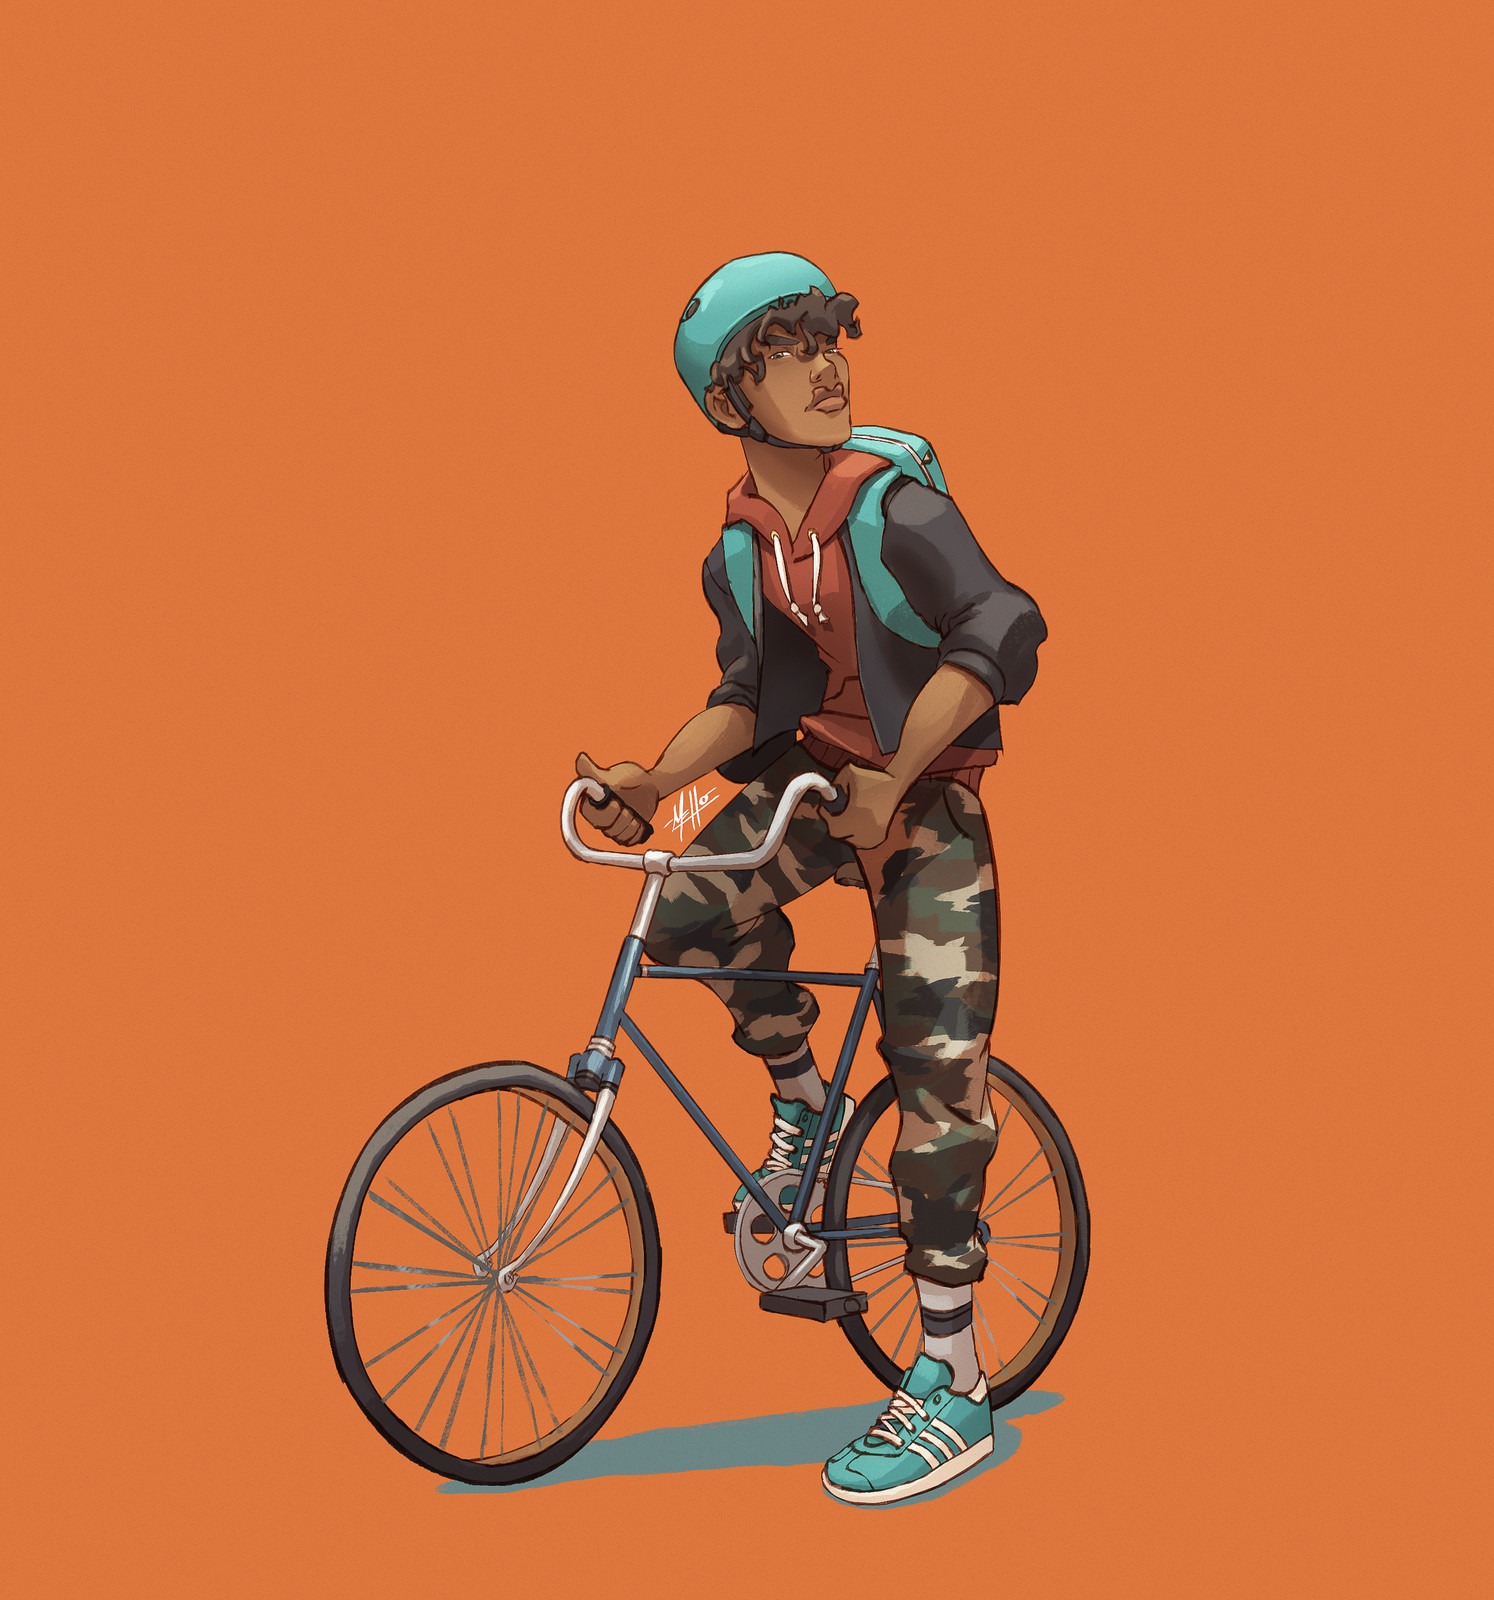 CDC-01-2018: Bikers